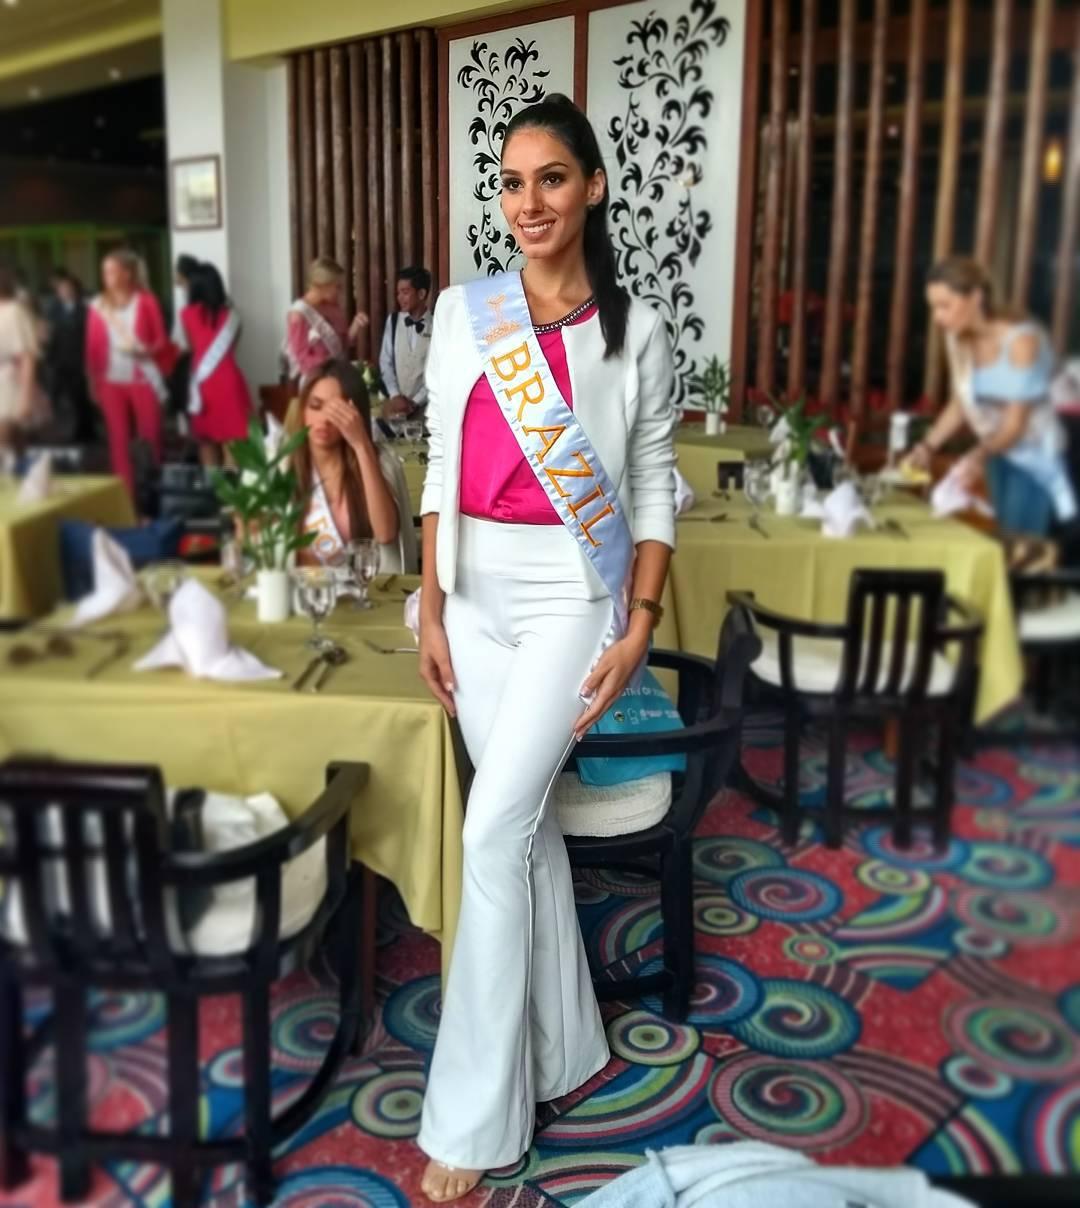 brasil vence miss global 2017. - Página 2 23421316